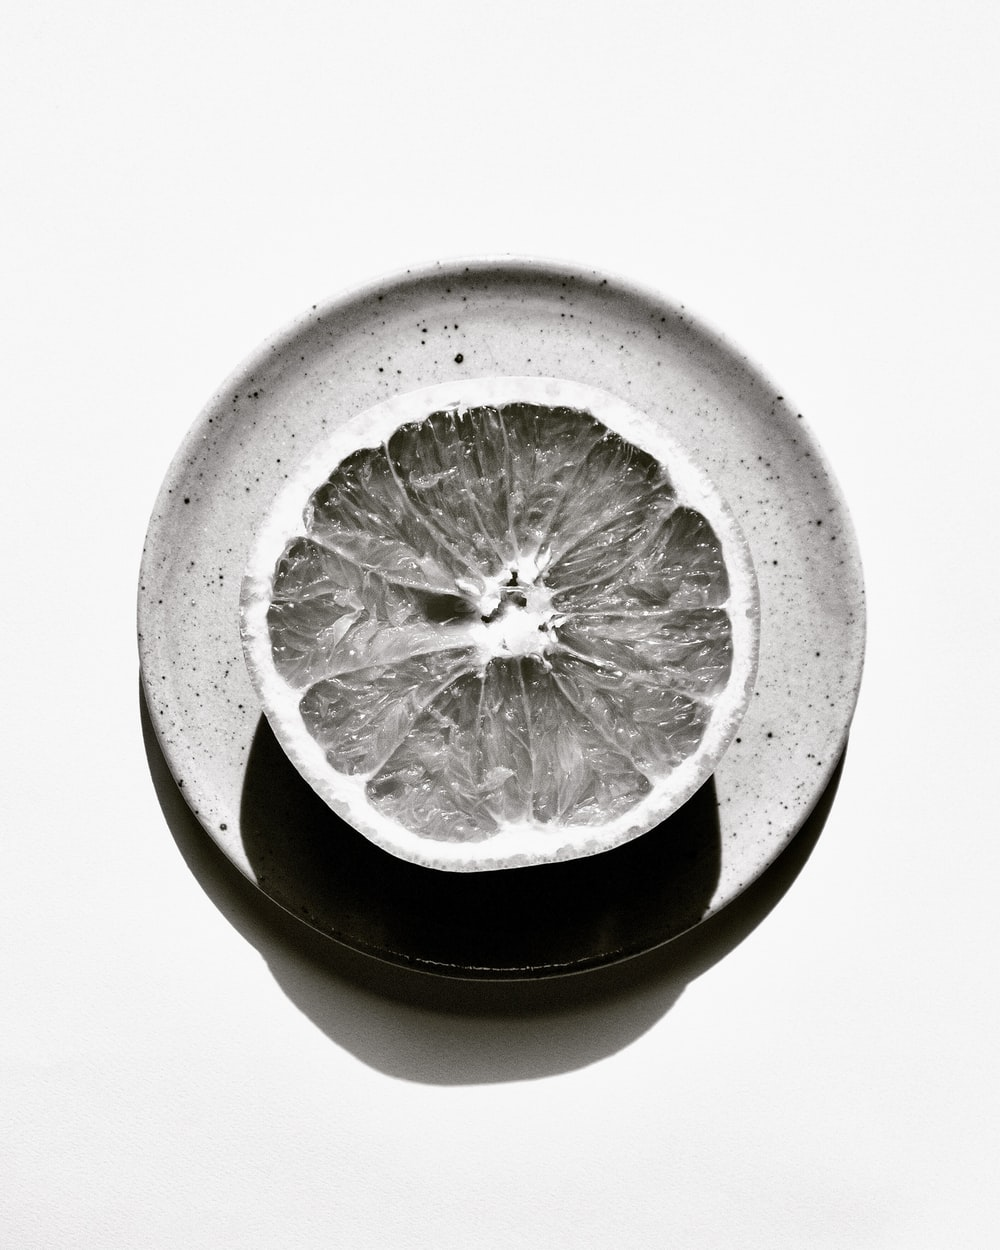 sliced lemon in white ceramic bowl